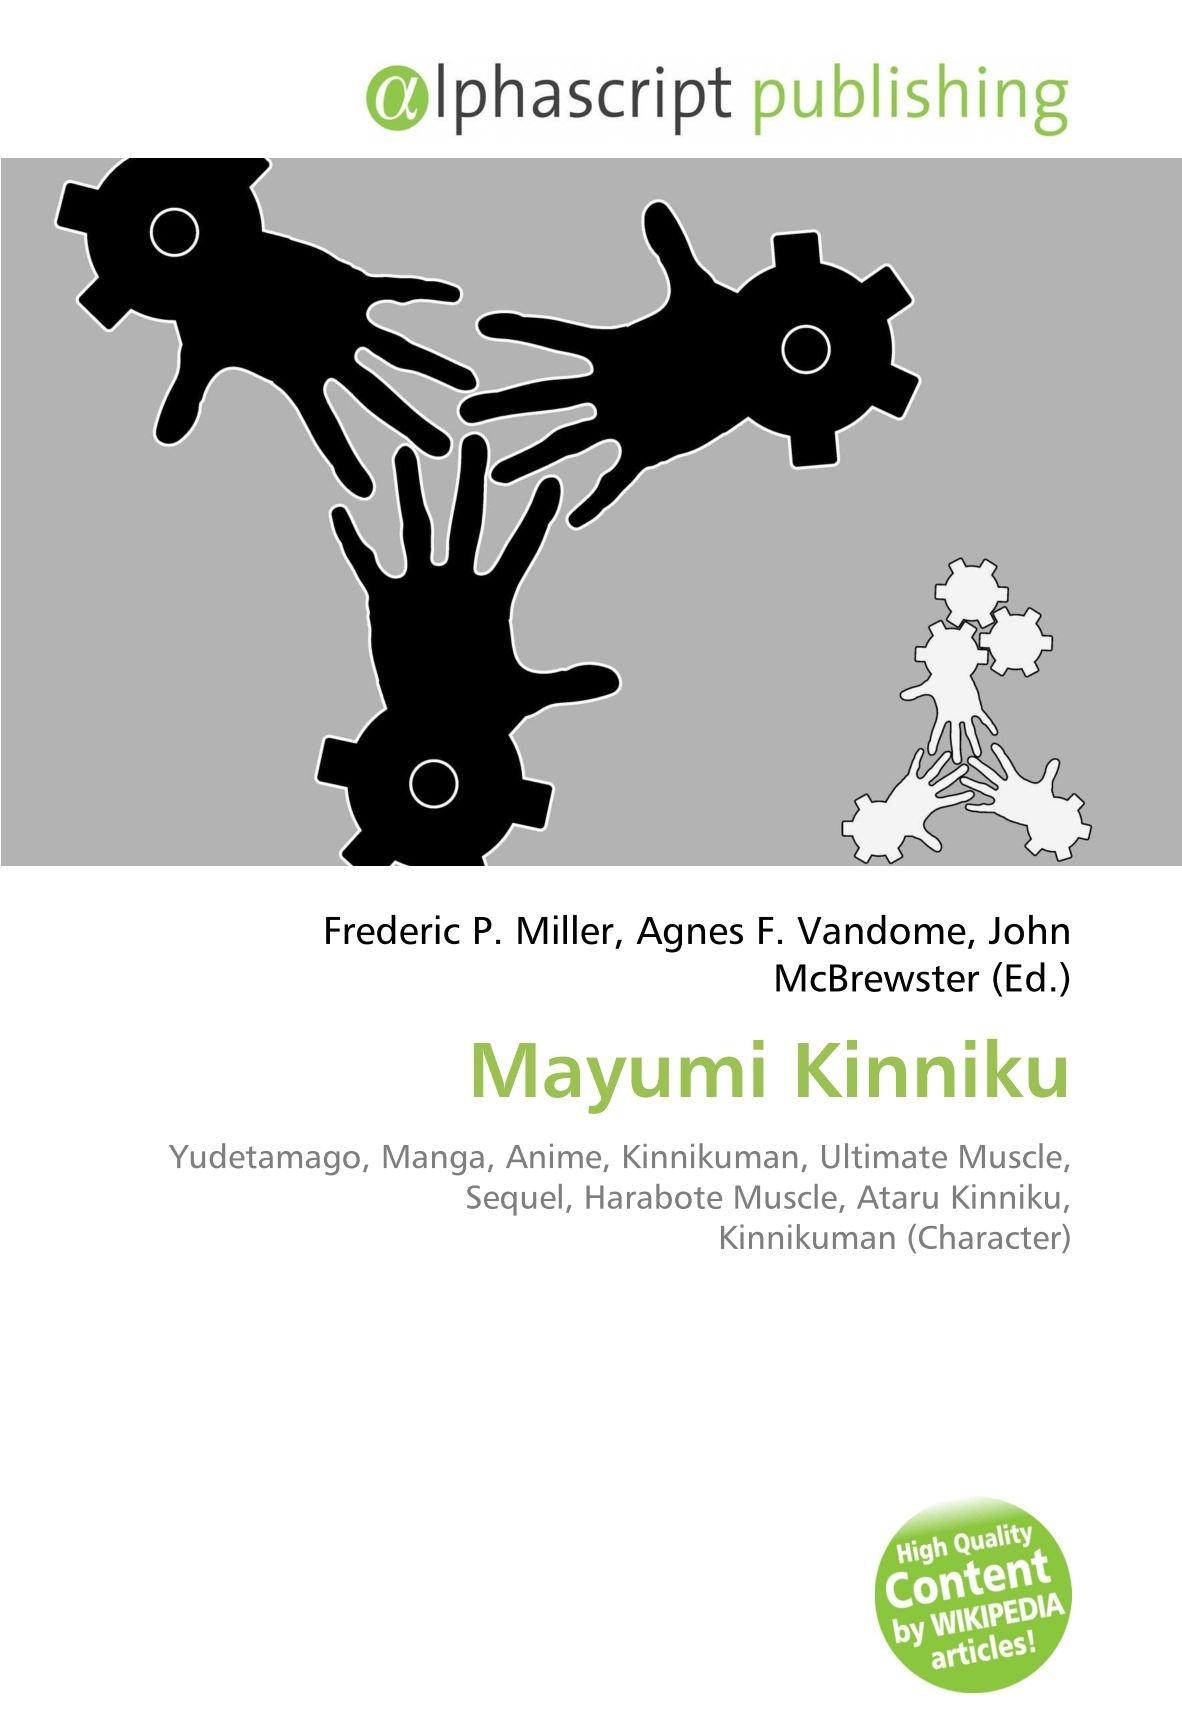 Mayumi Kinniku: Yudetamago, Manga, Anime, Kinnikuman, Ultimate Muscle, Sequel, Harabote Muscle, Ataru Kinniku, Kinnikuman Character: Amazon.es: Frederic P ...